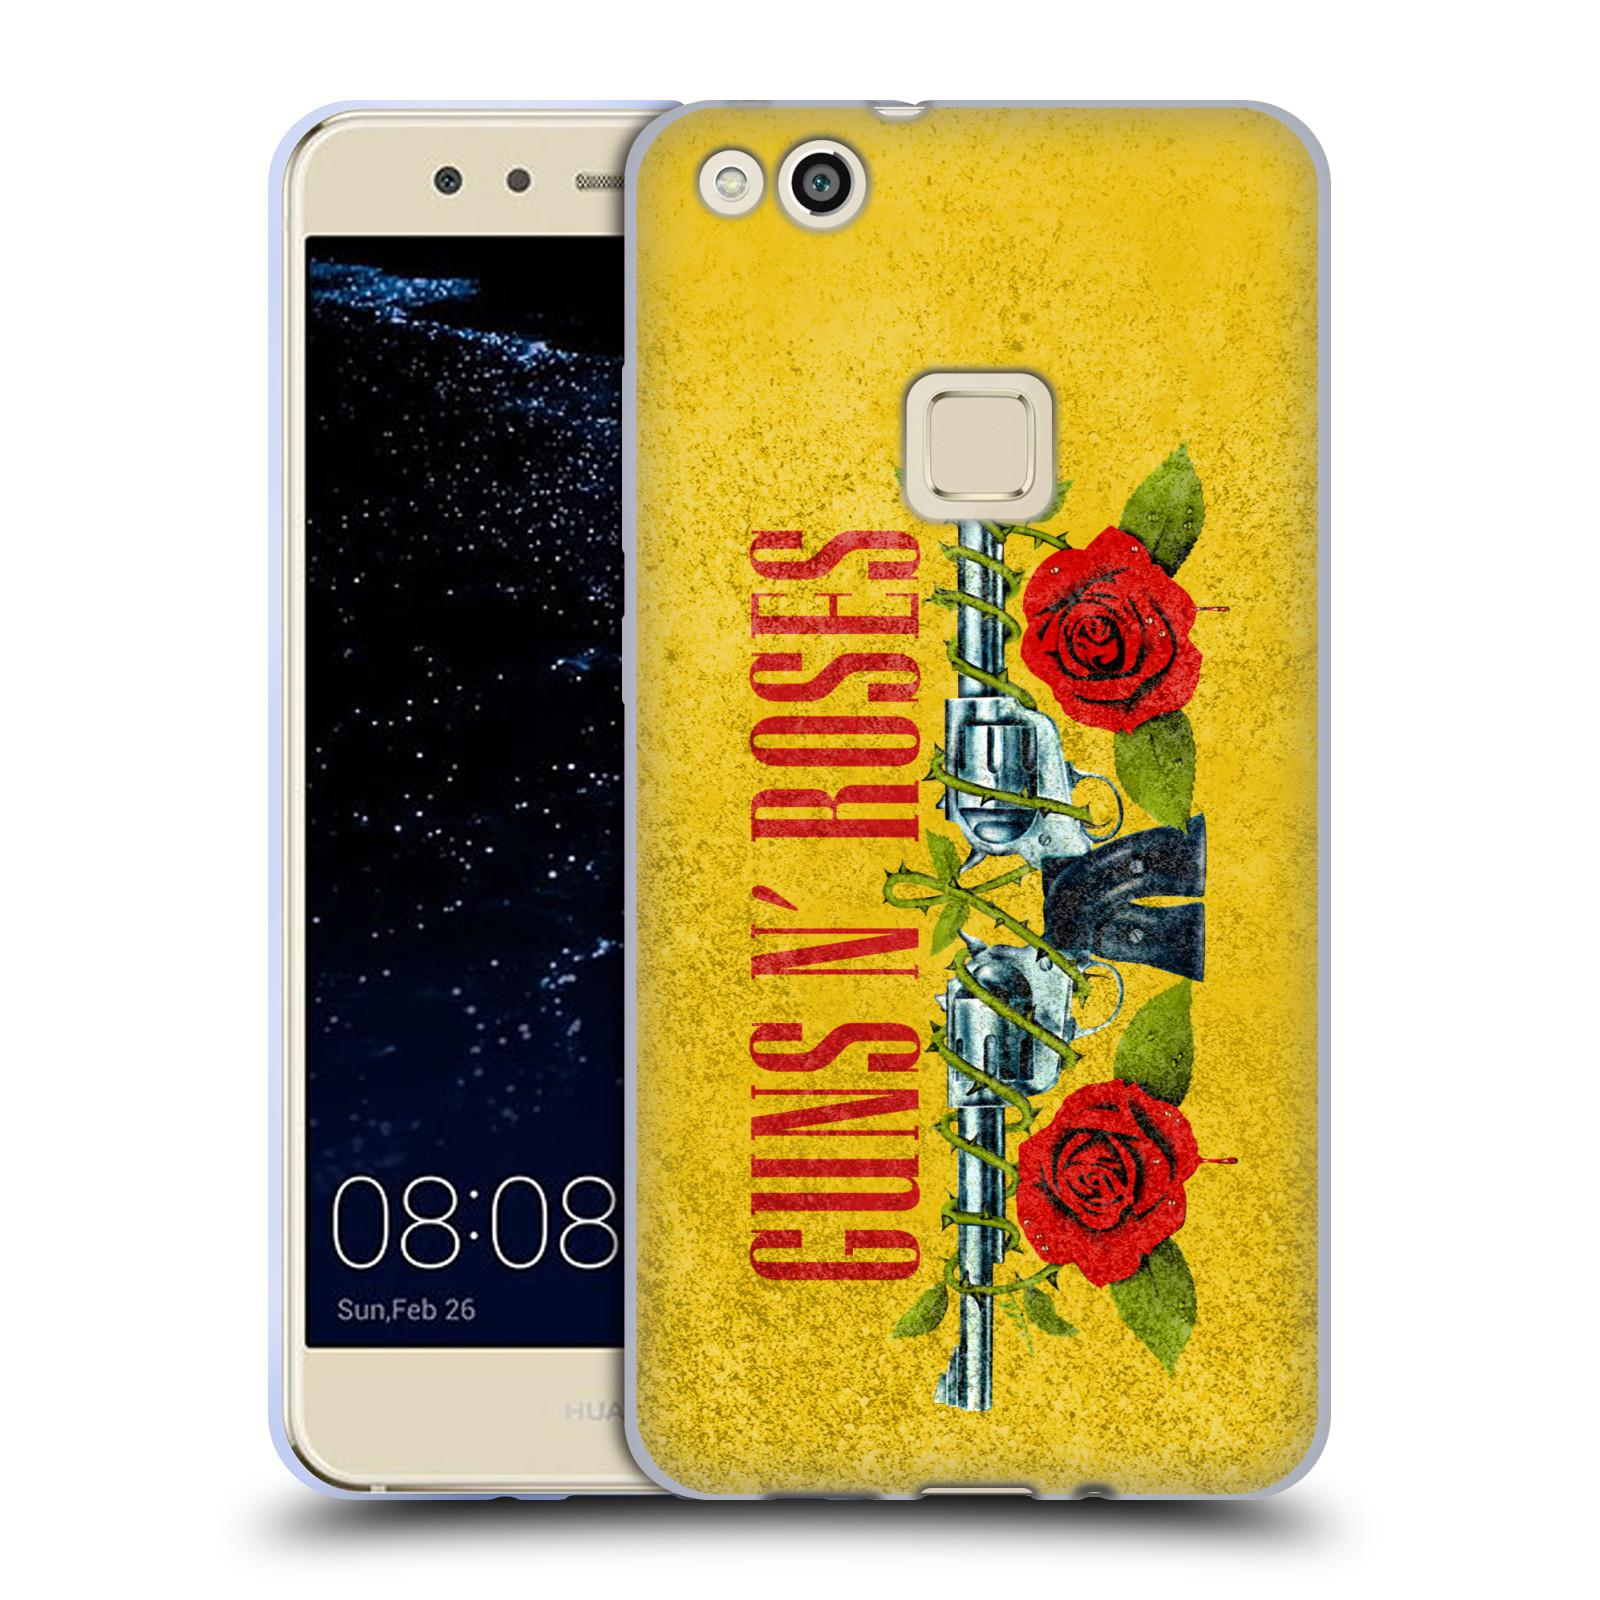 d9f95d133 HEAD CASE silikonový obal na mobil Huawei P10 LITE / Huawei P10 LITE DUAL  SIM hudební skupina Guns N Roses pistole a růže žluté pozadí